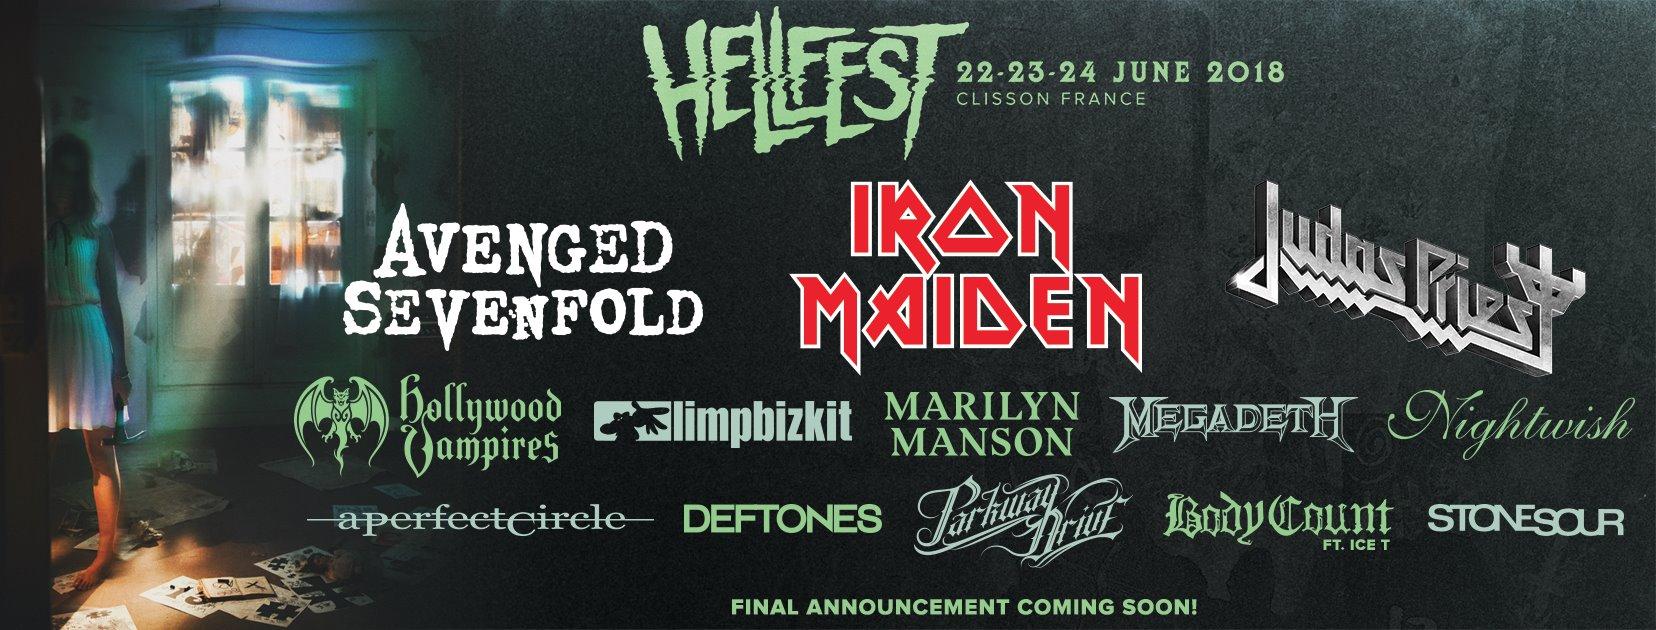 Hellfest 2018 bandeau